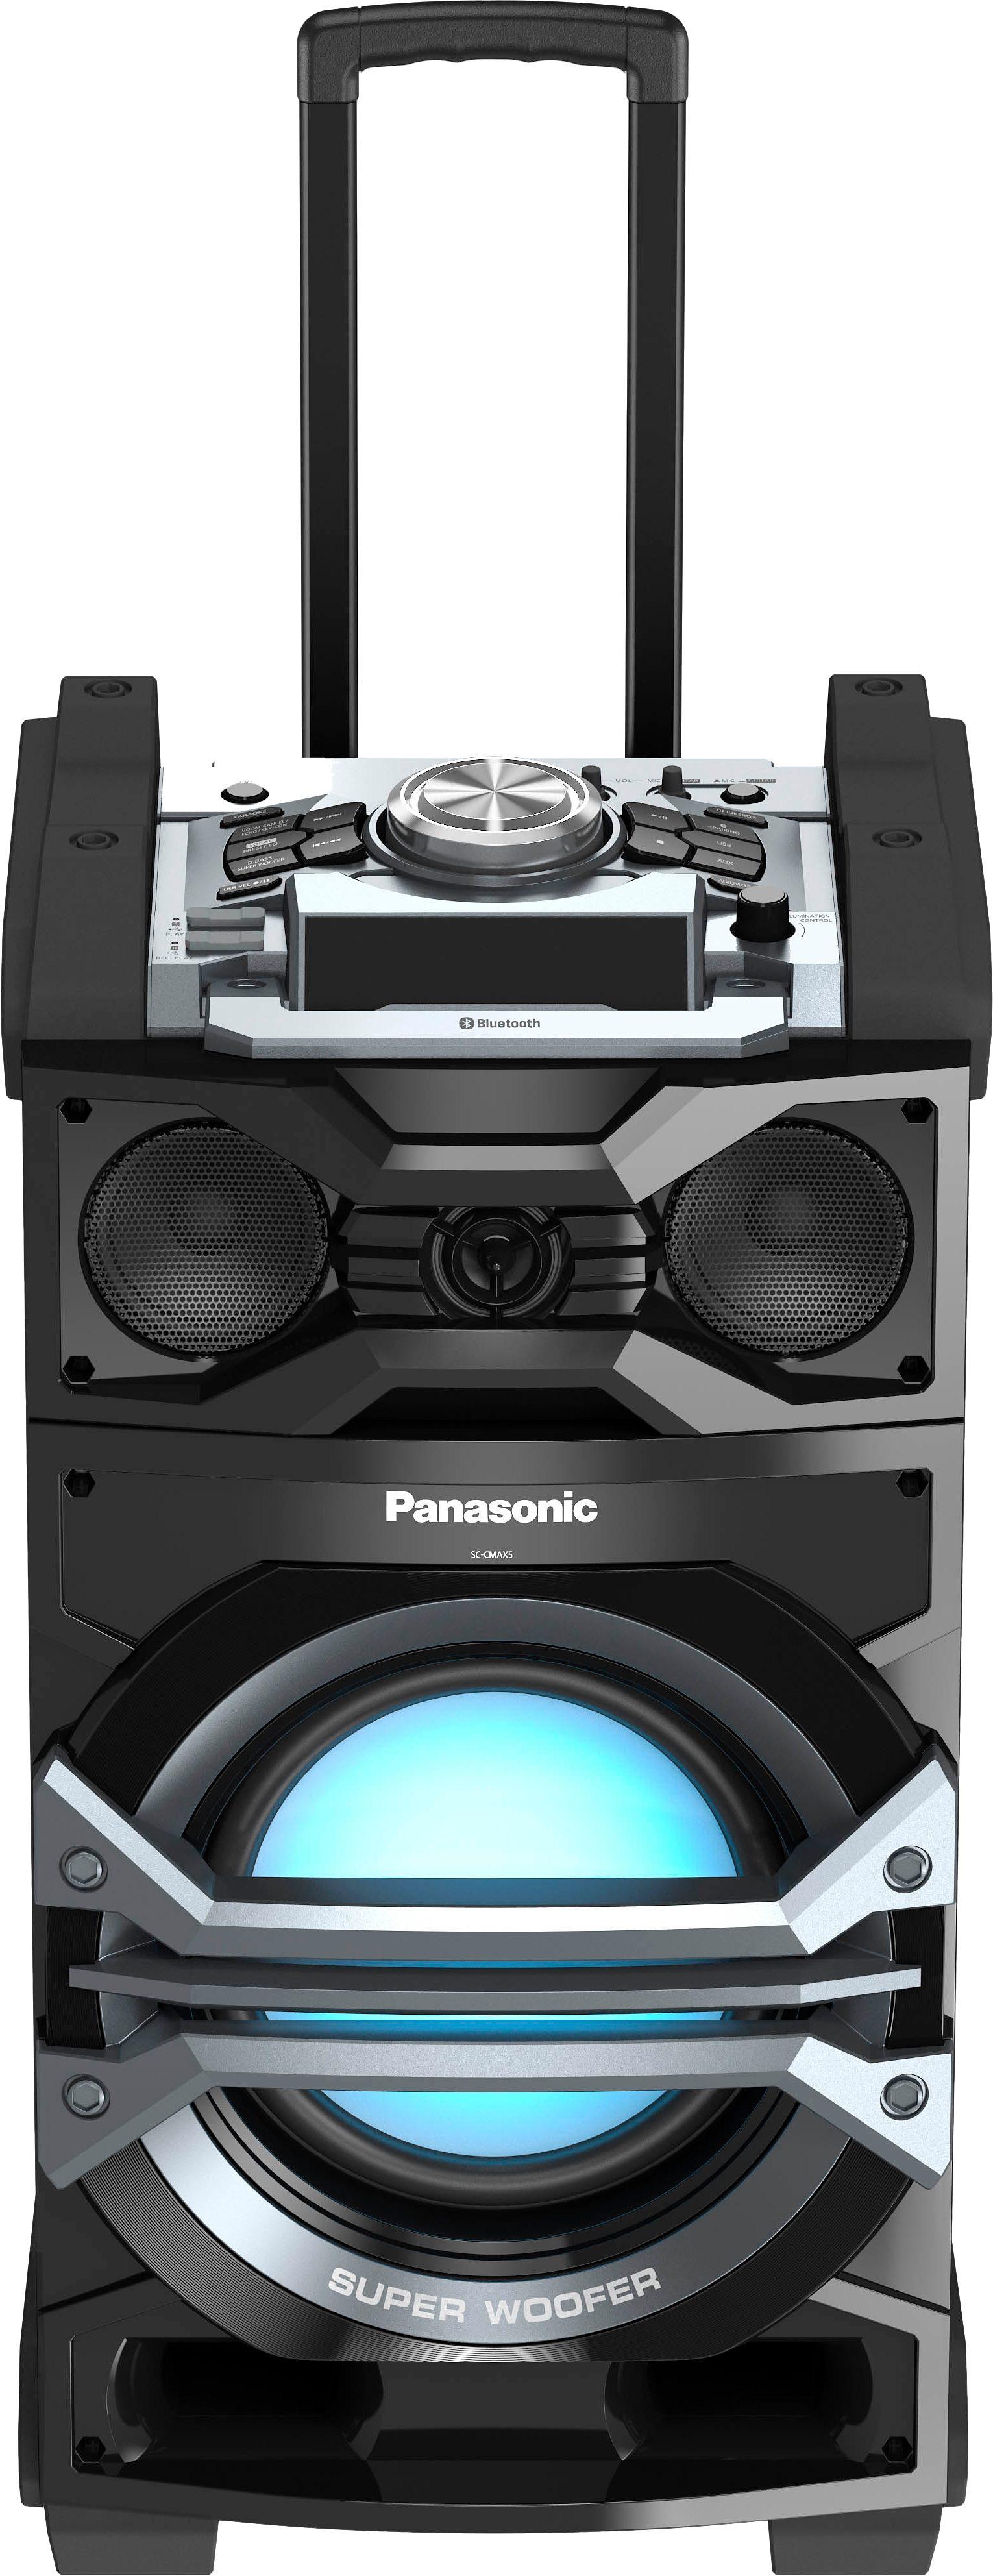 Panasonic SC-CMAX5 Stereoanlage, Juke, Bluetooth, 2x USB